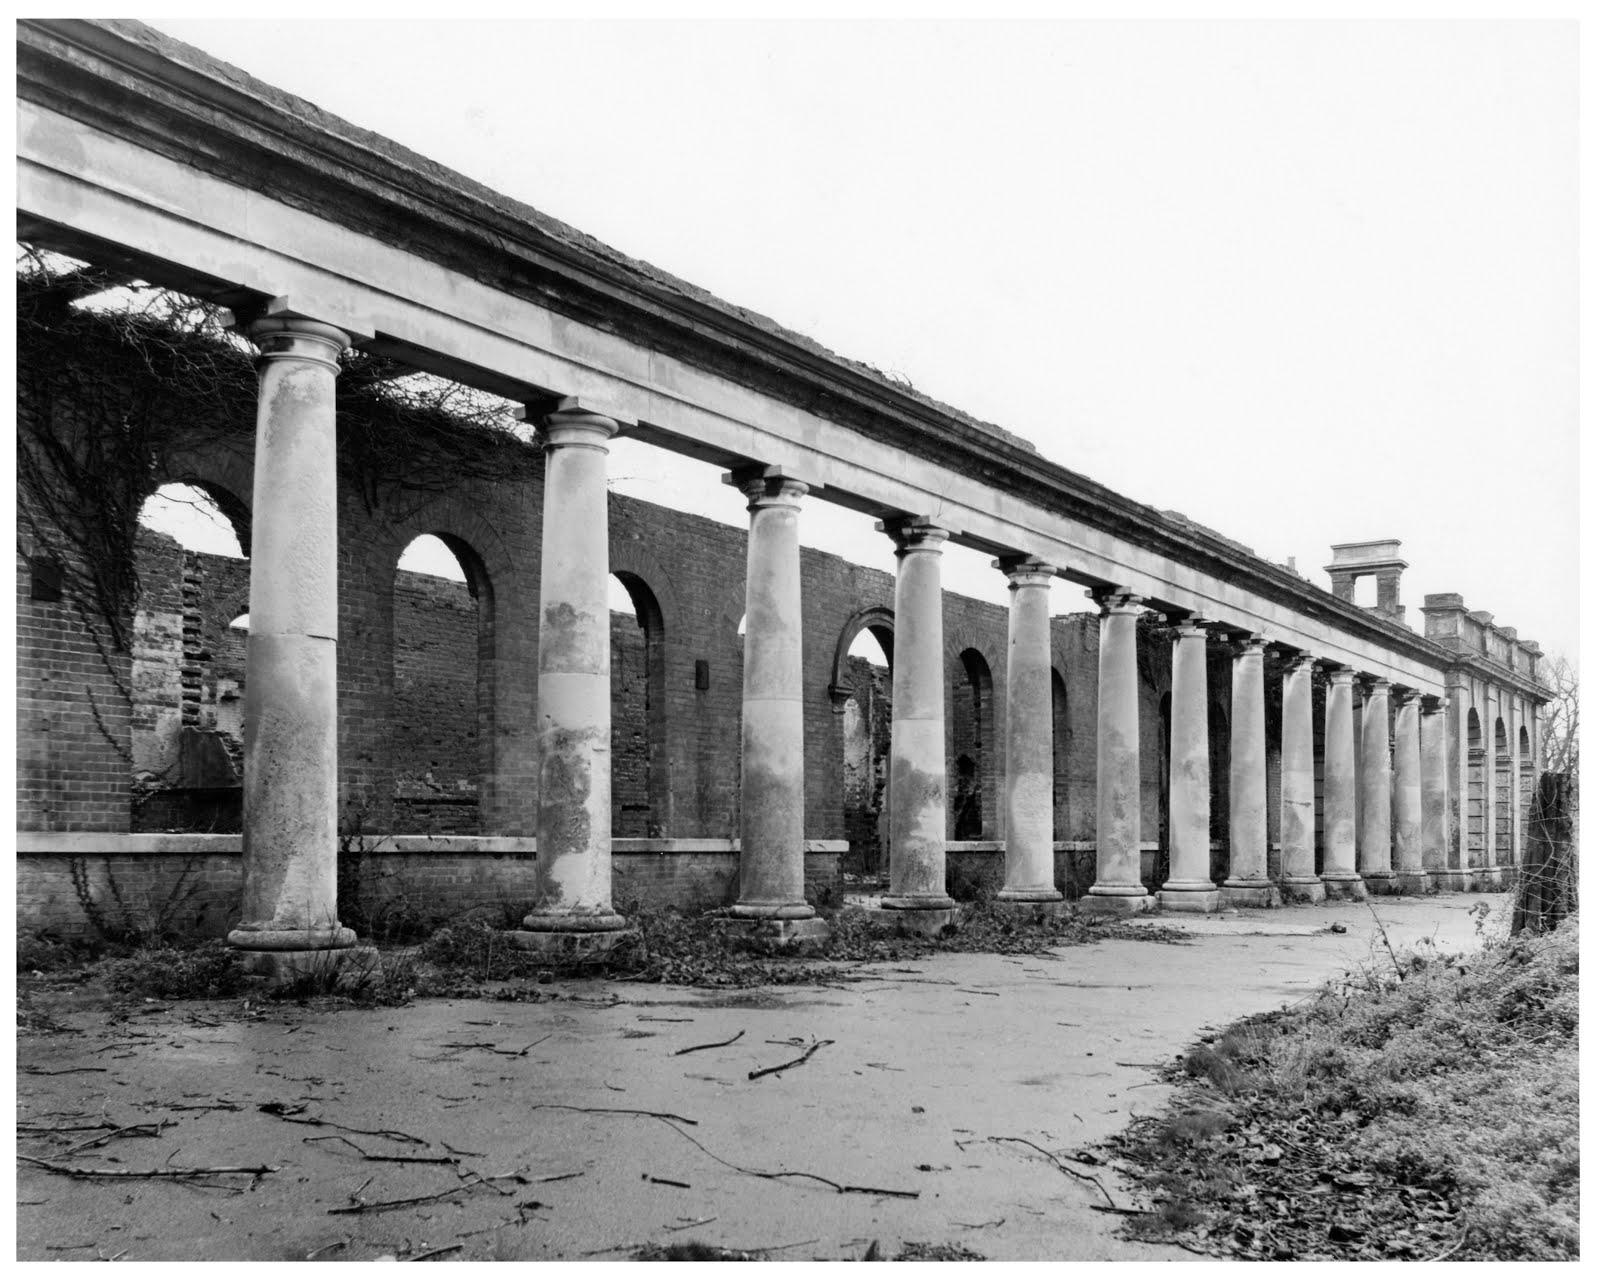 Colonnade 1869